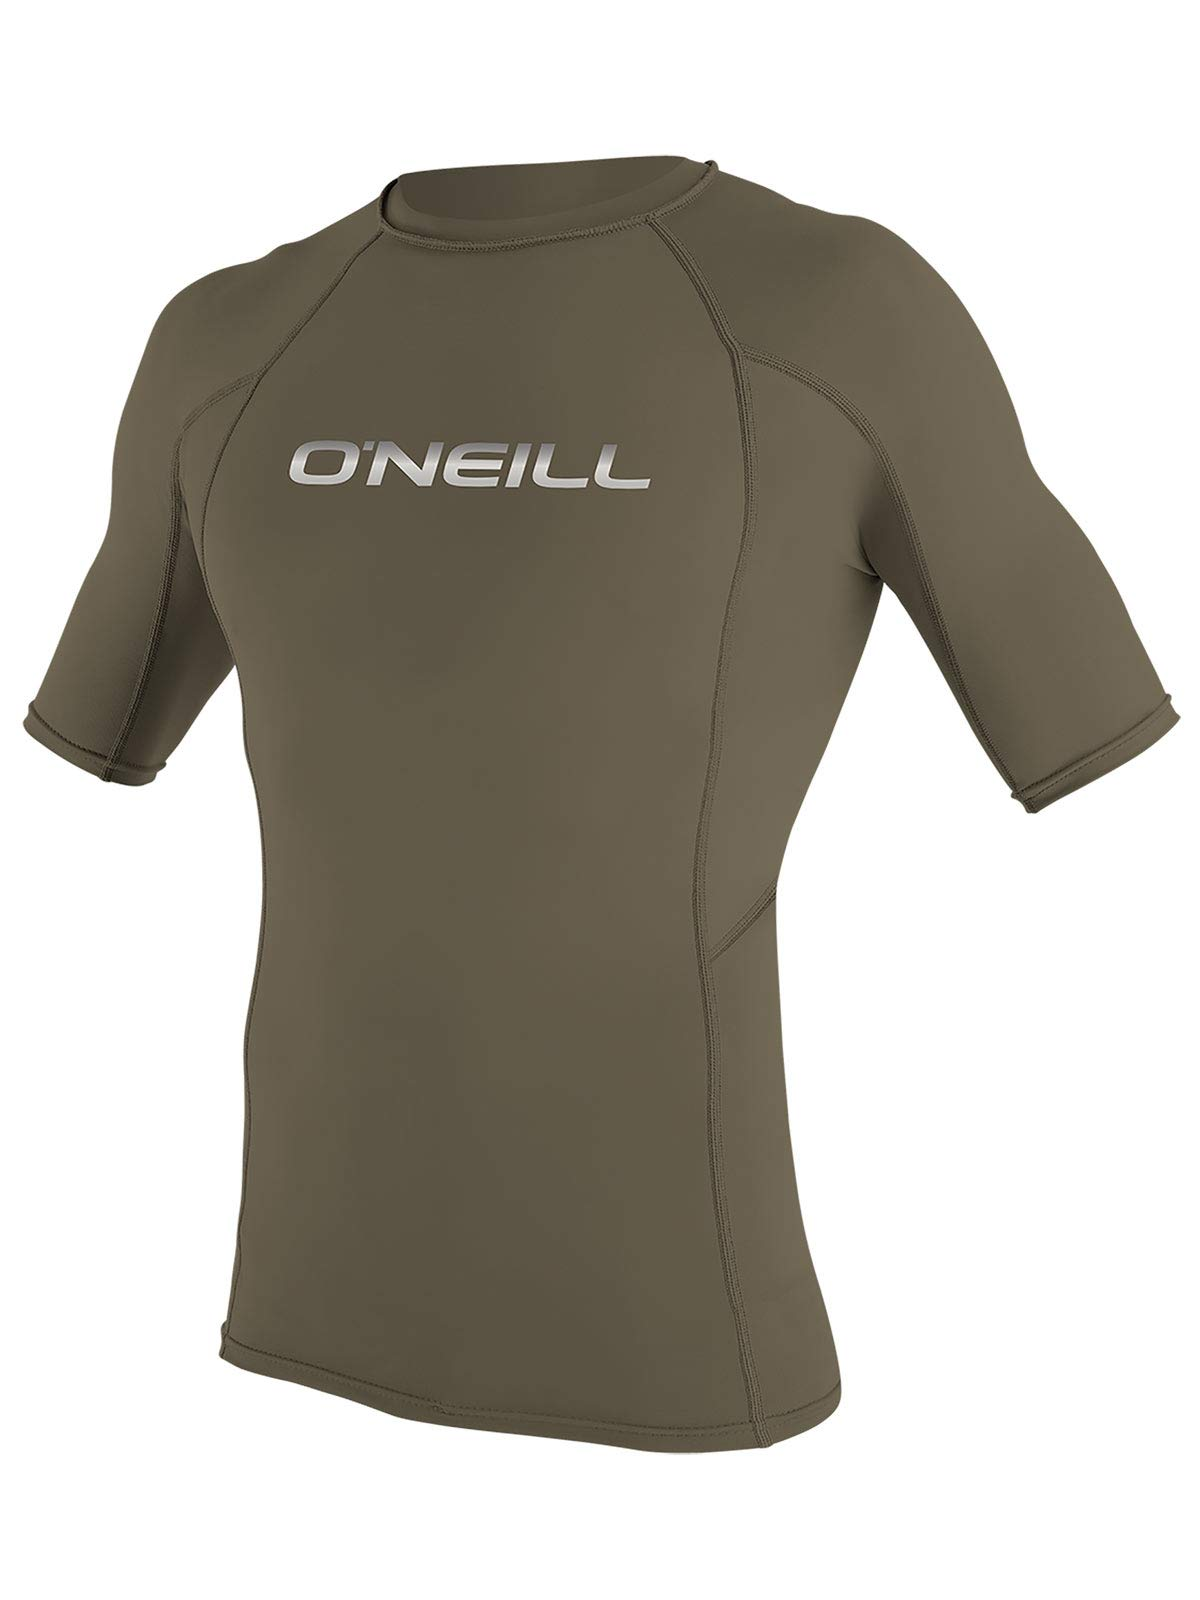 O'Neill Men's Basic Skins Short Sleeve Rashguard M Khaki (3341IB)